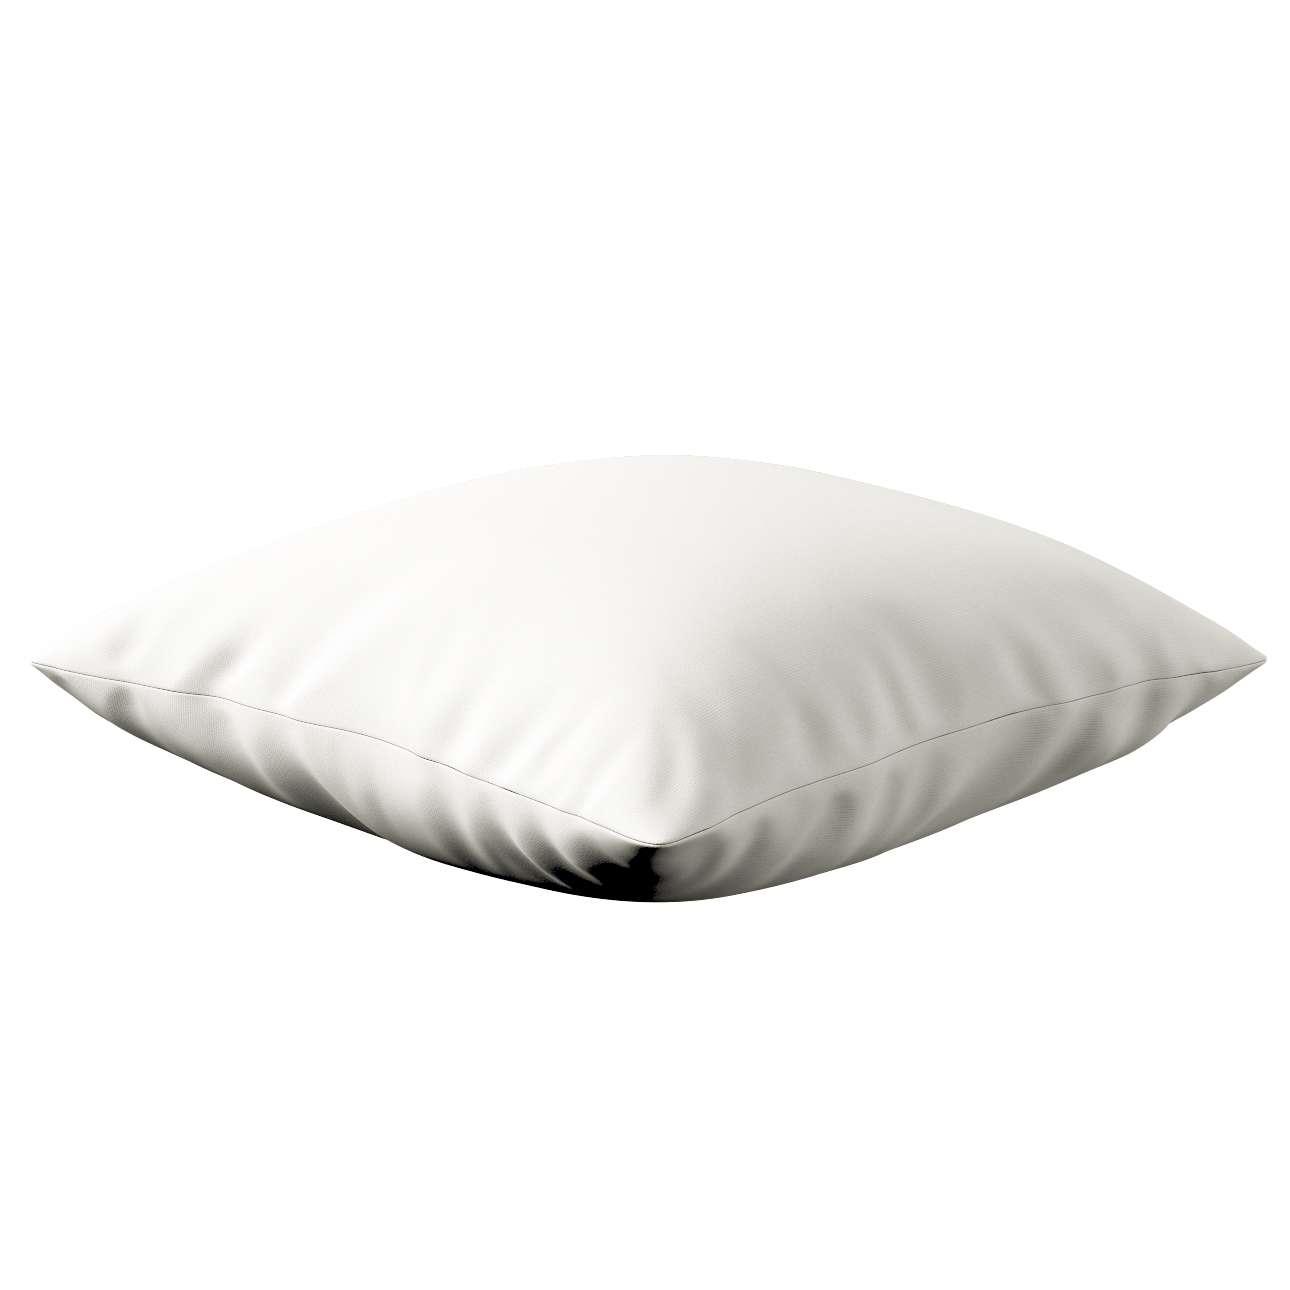 Párnahuzat Kinga 45 × 45 cm a kollekcióból Bútorszövet Cotton Panama, Dekoranyag: 702-34